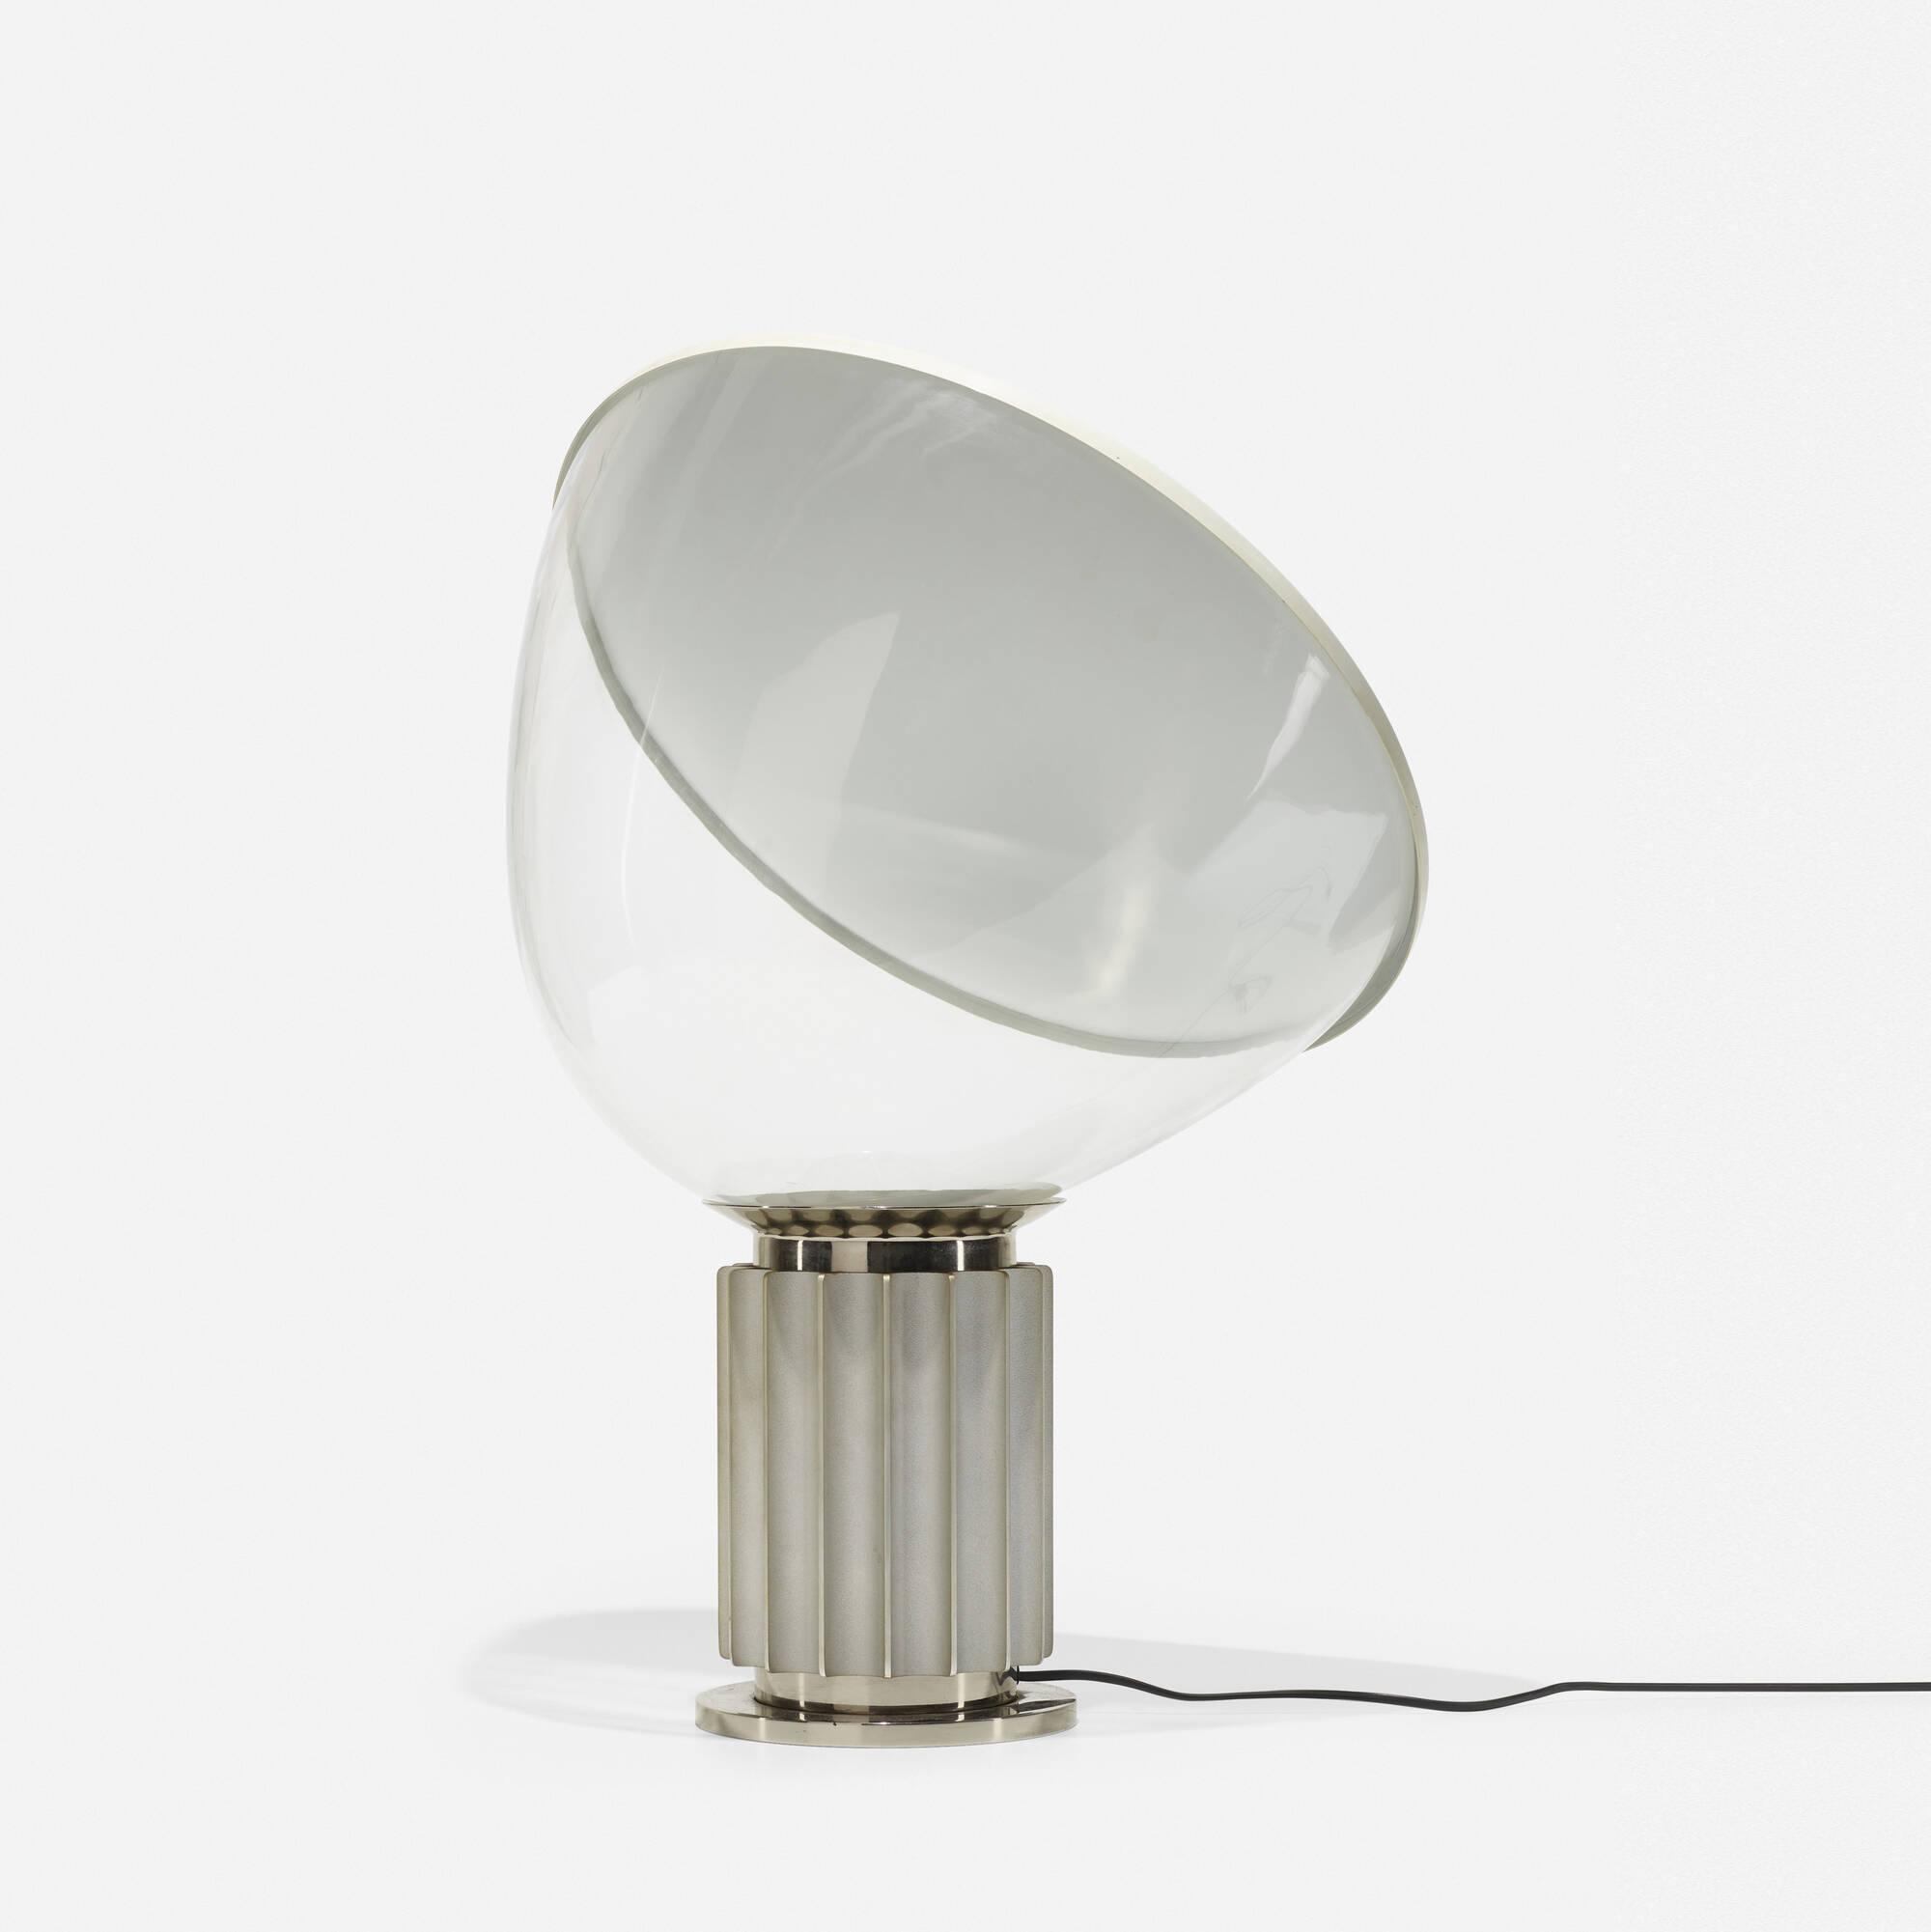 383 achille and pier giacomo castiglioni taccia table lamp 383 achille and pier giacomo castiglioni taccia table lamp 2 of 3 aloadofball Images